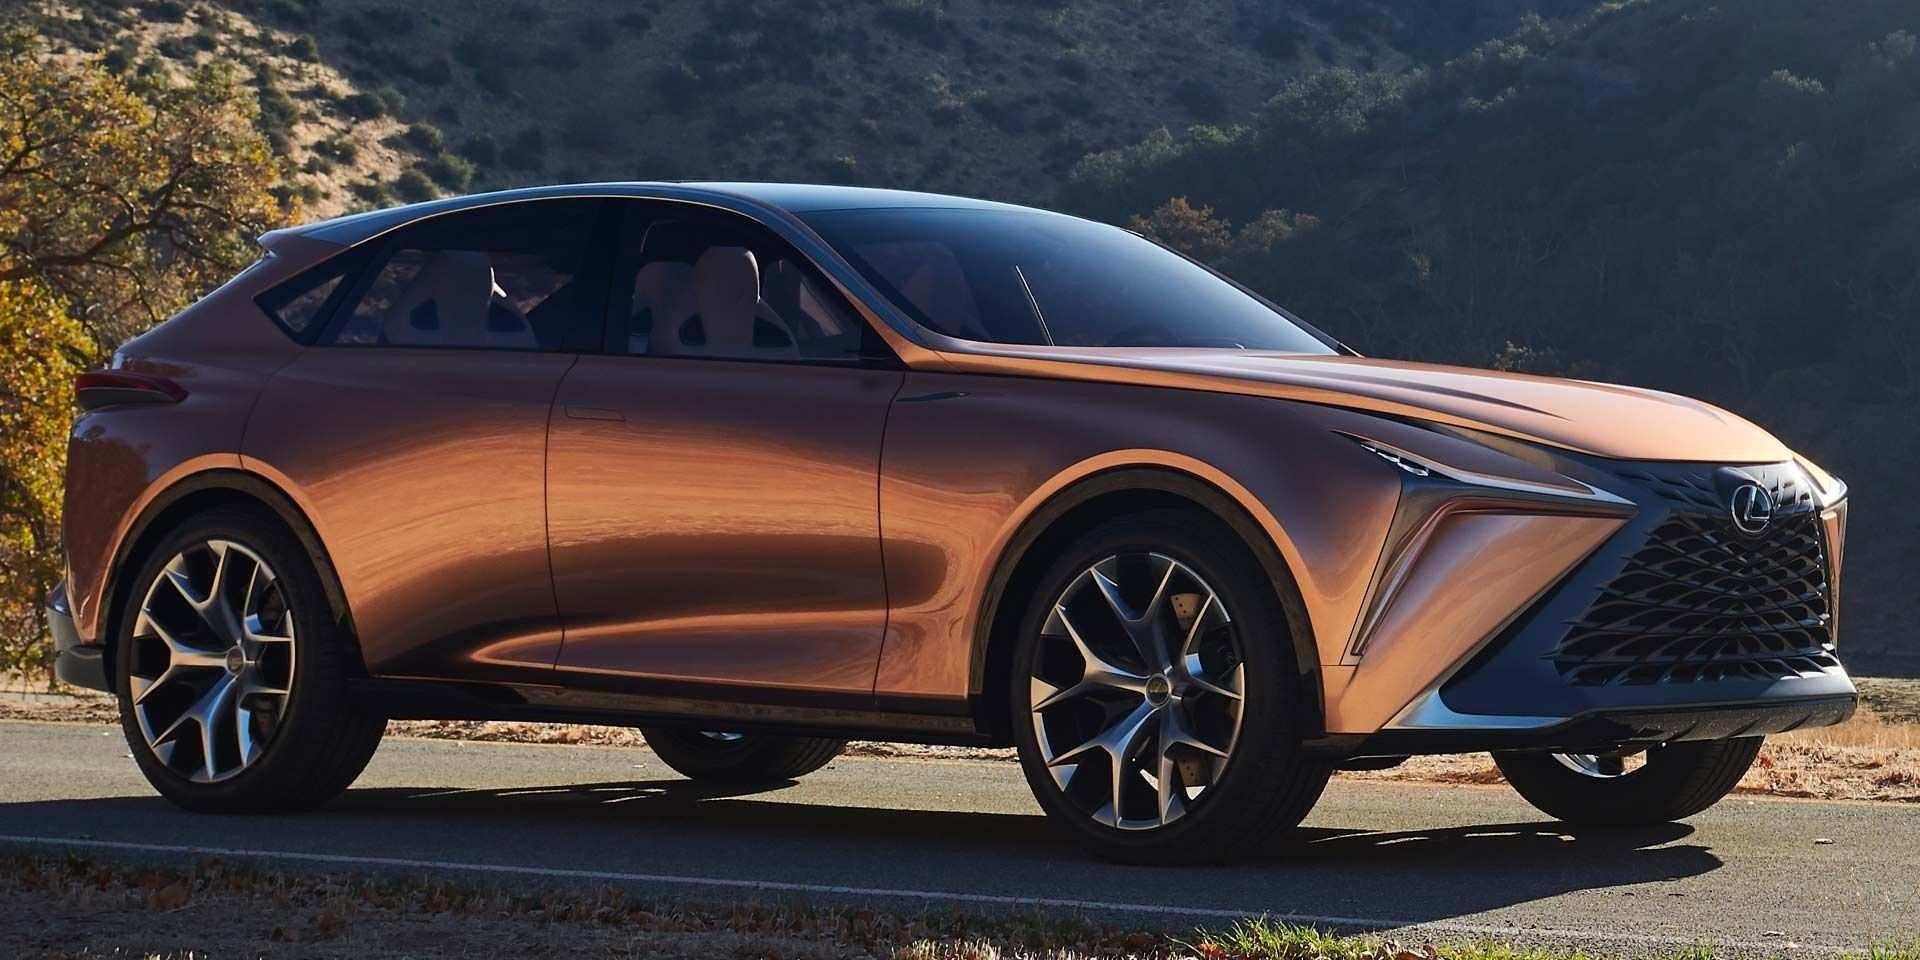 40 New New Lexus Future Cars 2019 Performance Configurations for New Lexus Future Cars 2019 Performance